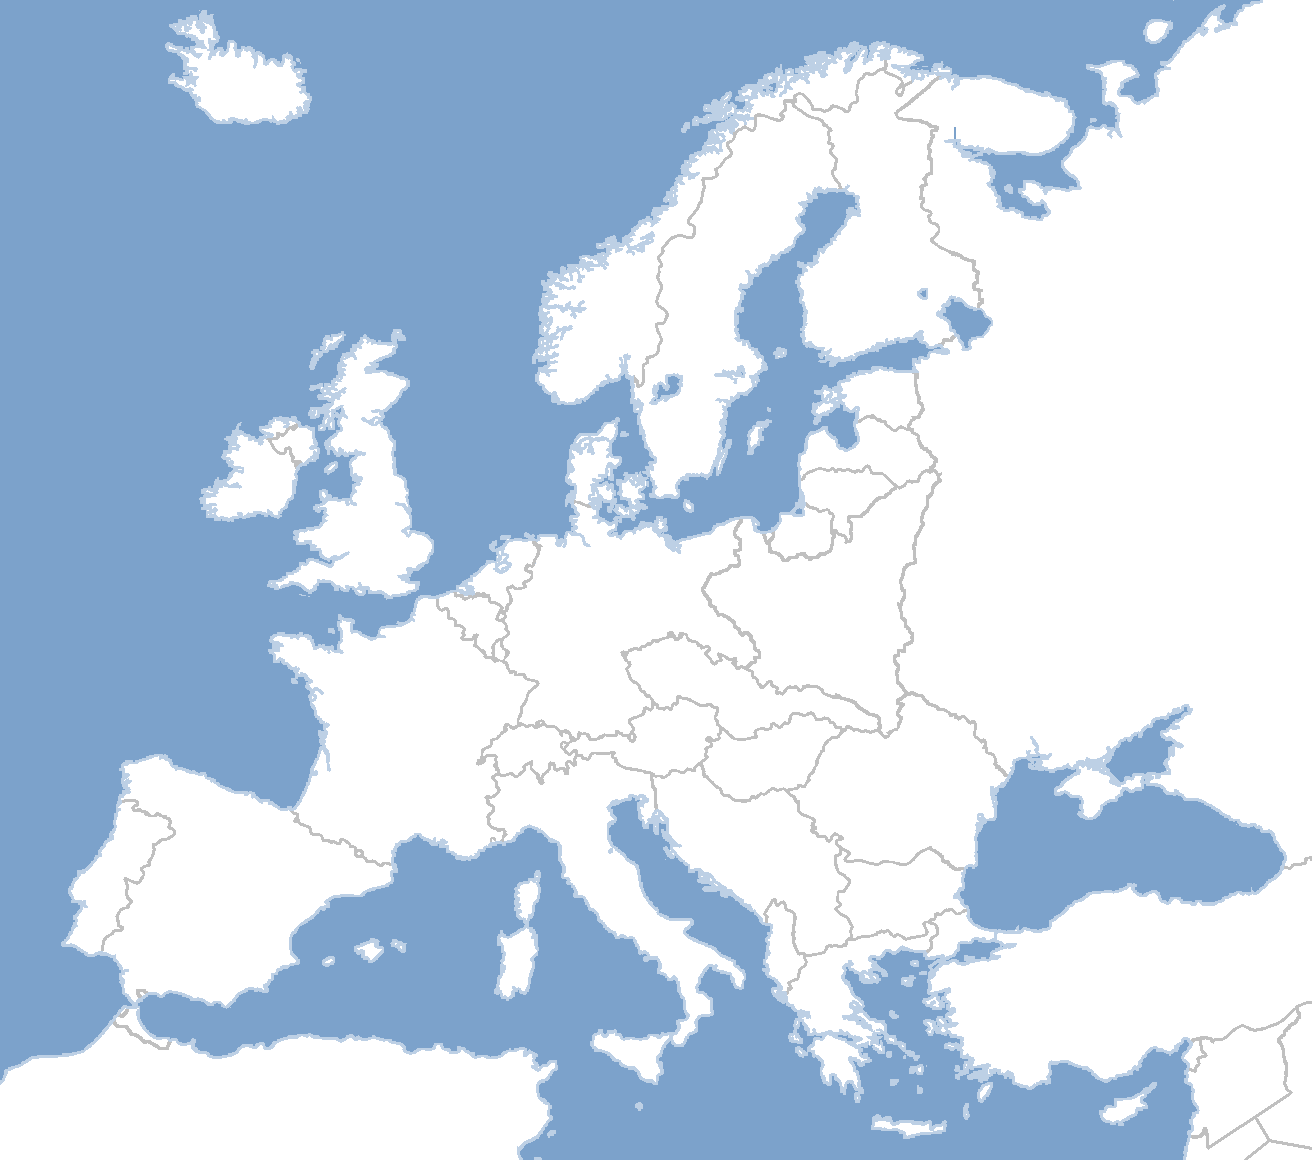 blank_map_directory:all_of_europe_2 [alternatehistory.com wiki]